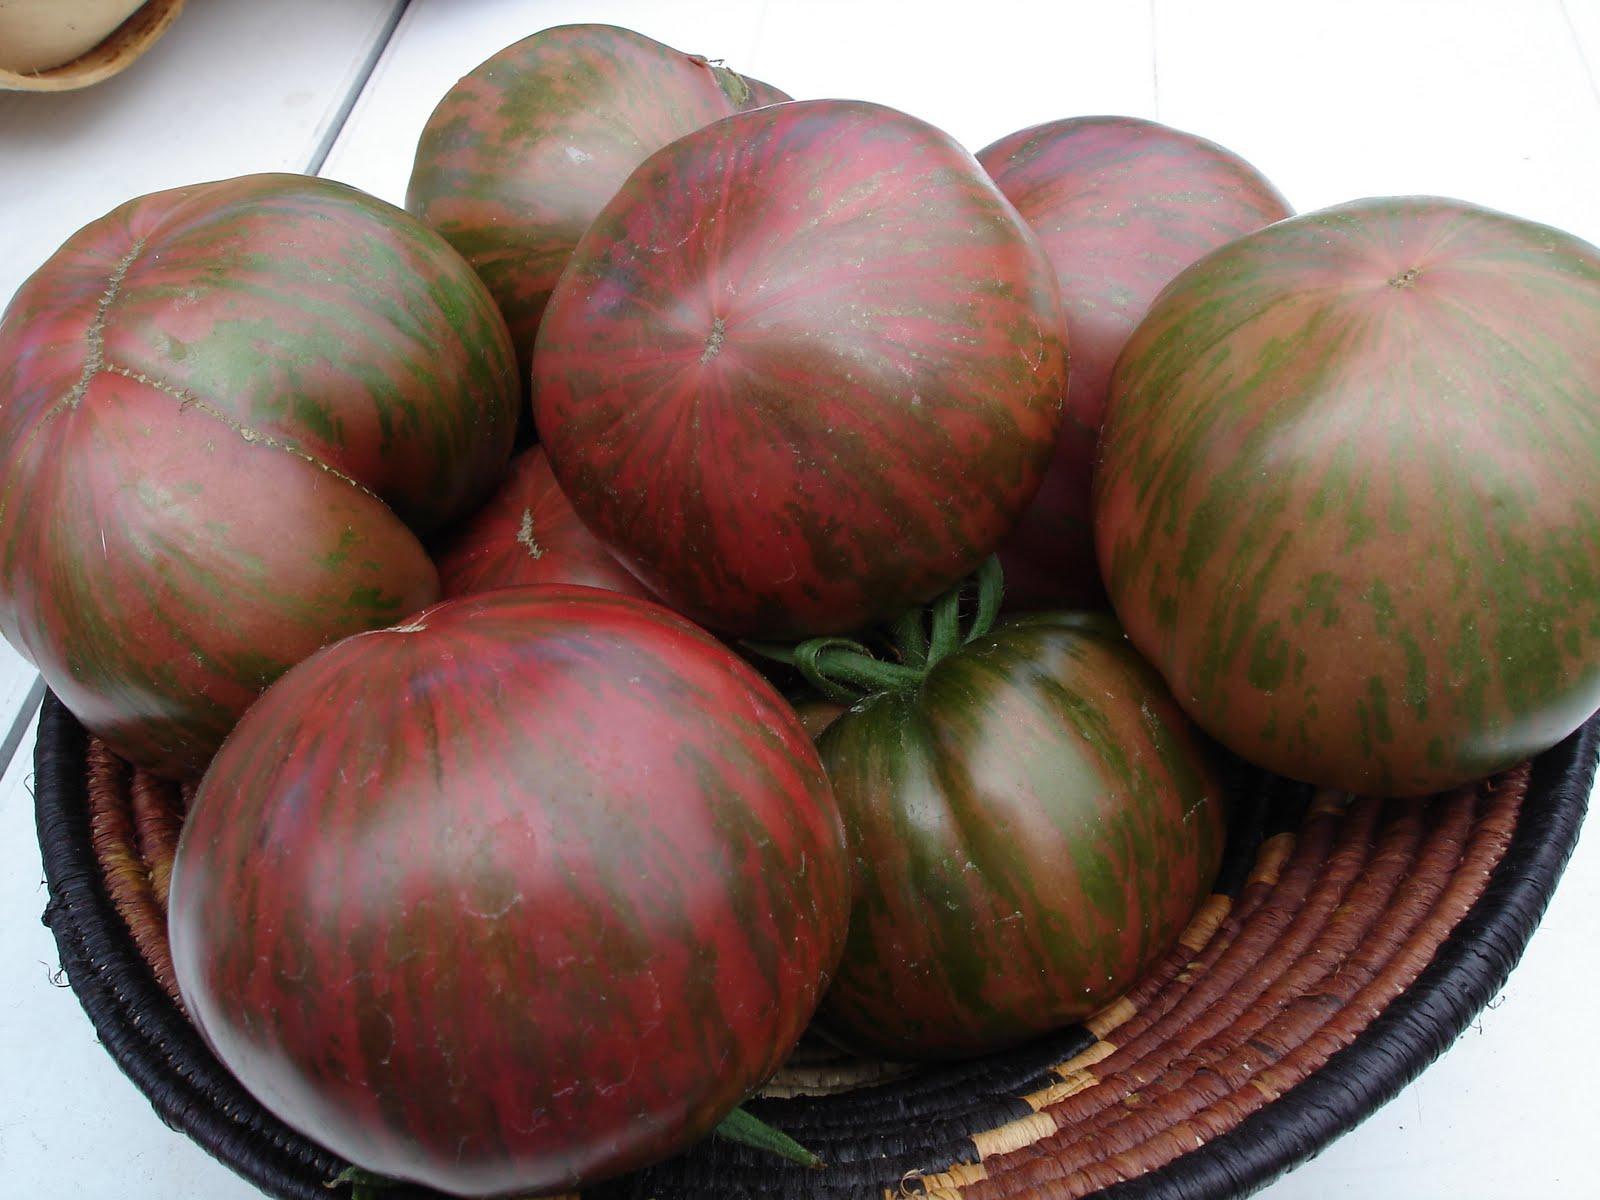 ✅ томат беркли тай дай хаат описание сорта - питомник46.рф